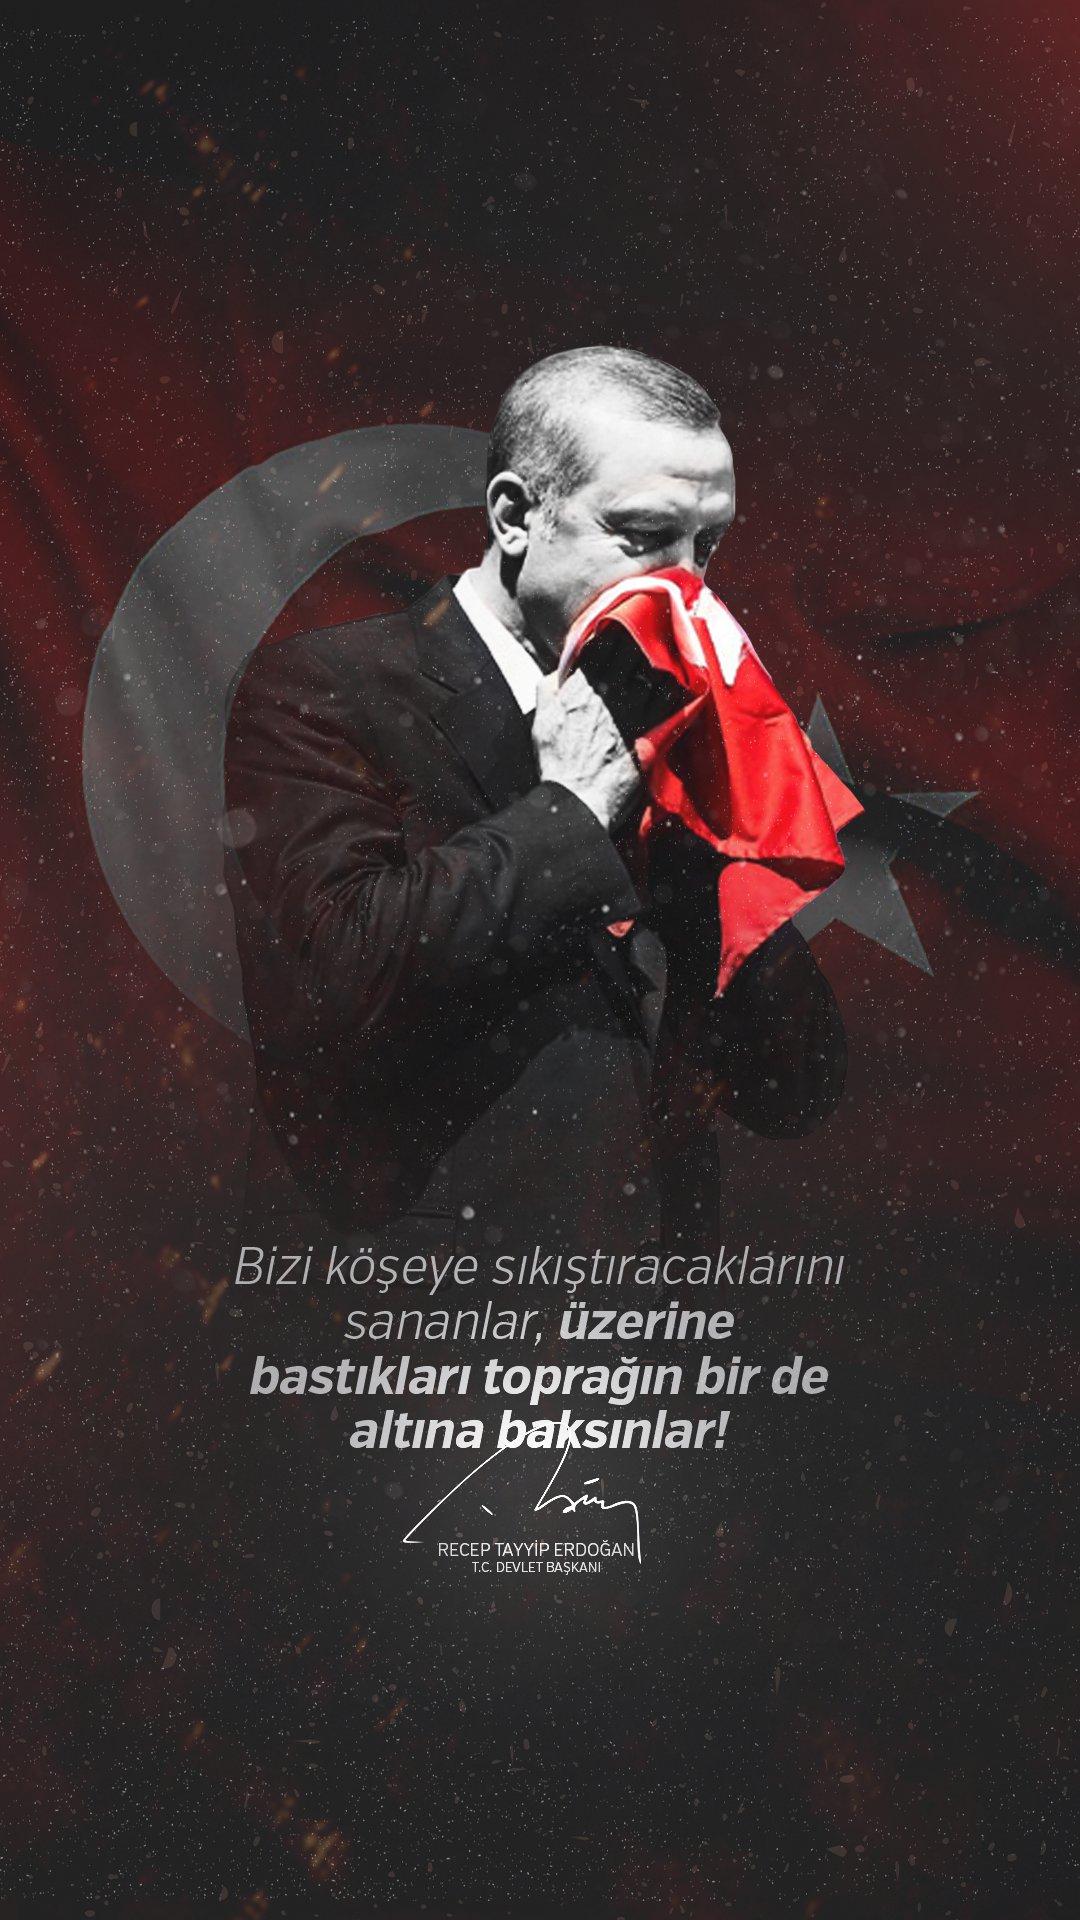 Recep Tayyip Erdoğan Mobil Arka Plan